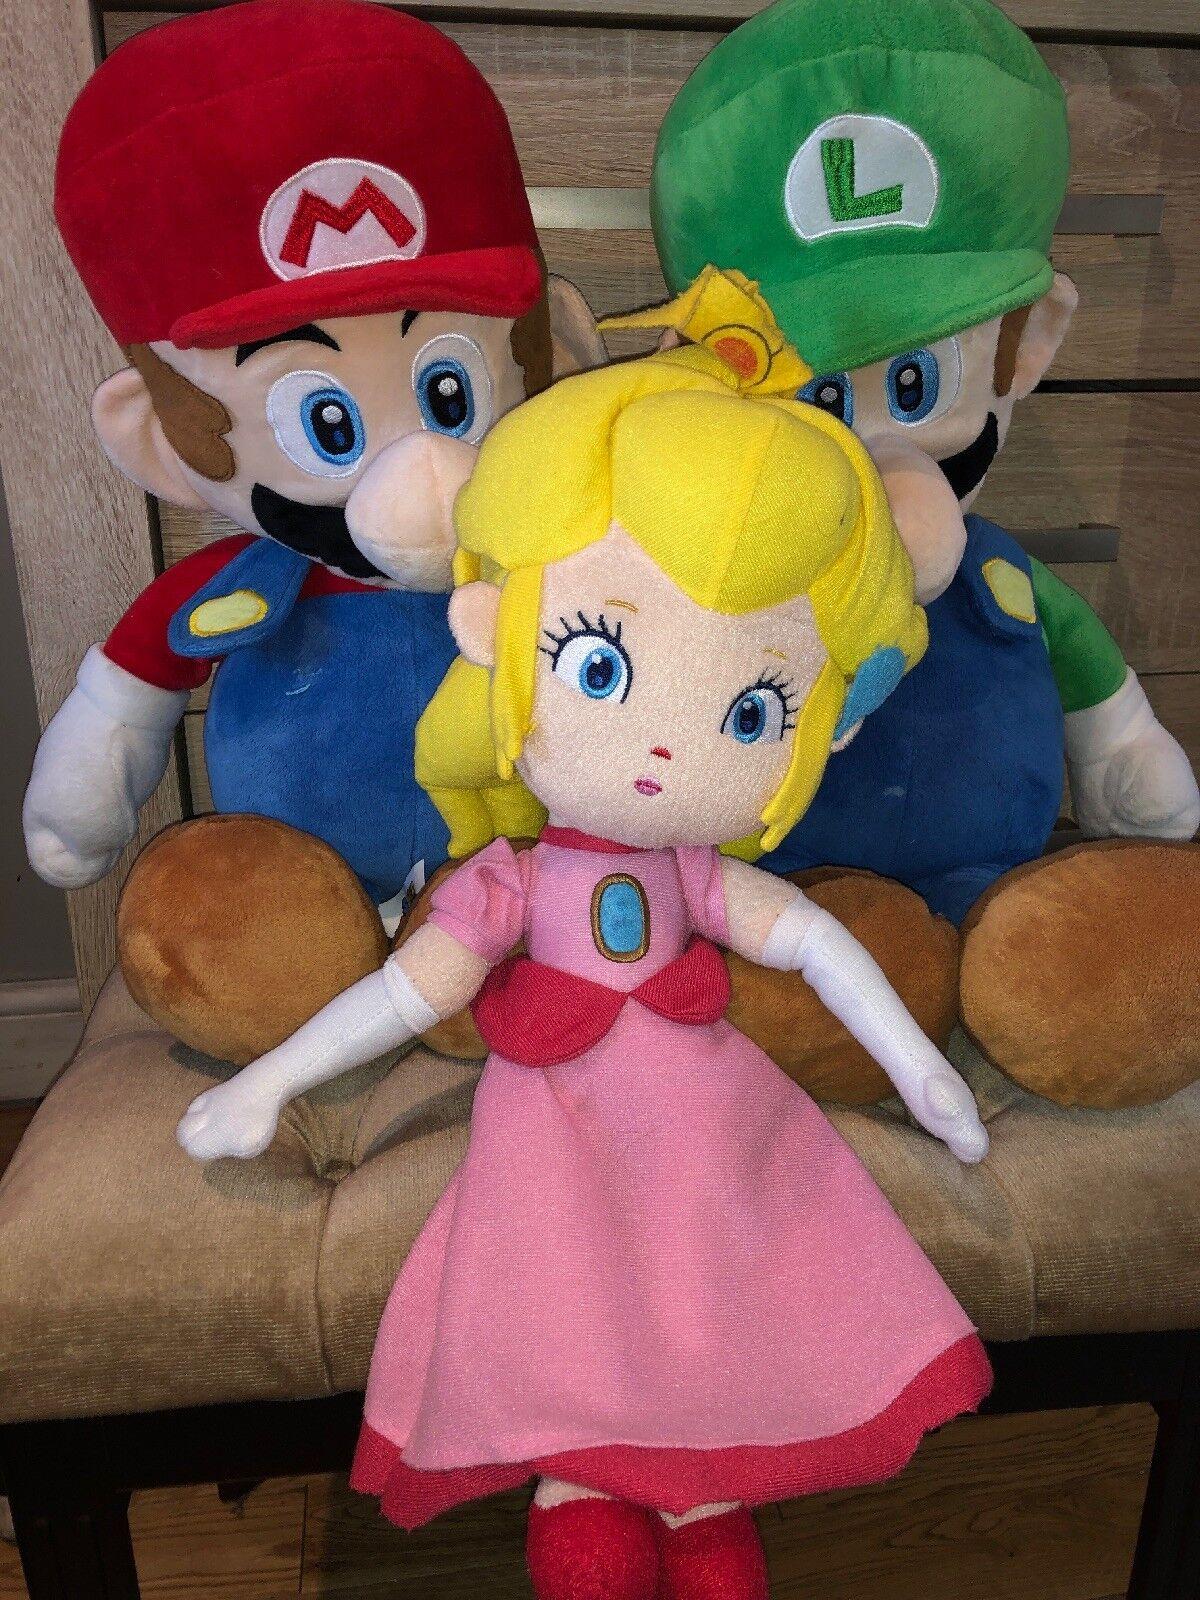 Mario Luigi Donkey Kong Princess Peach Large Teddy Soft Toy Bundle Big